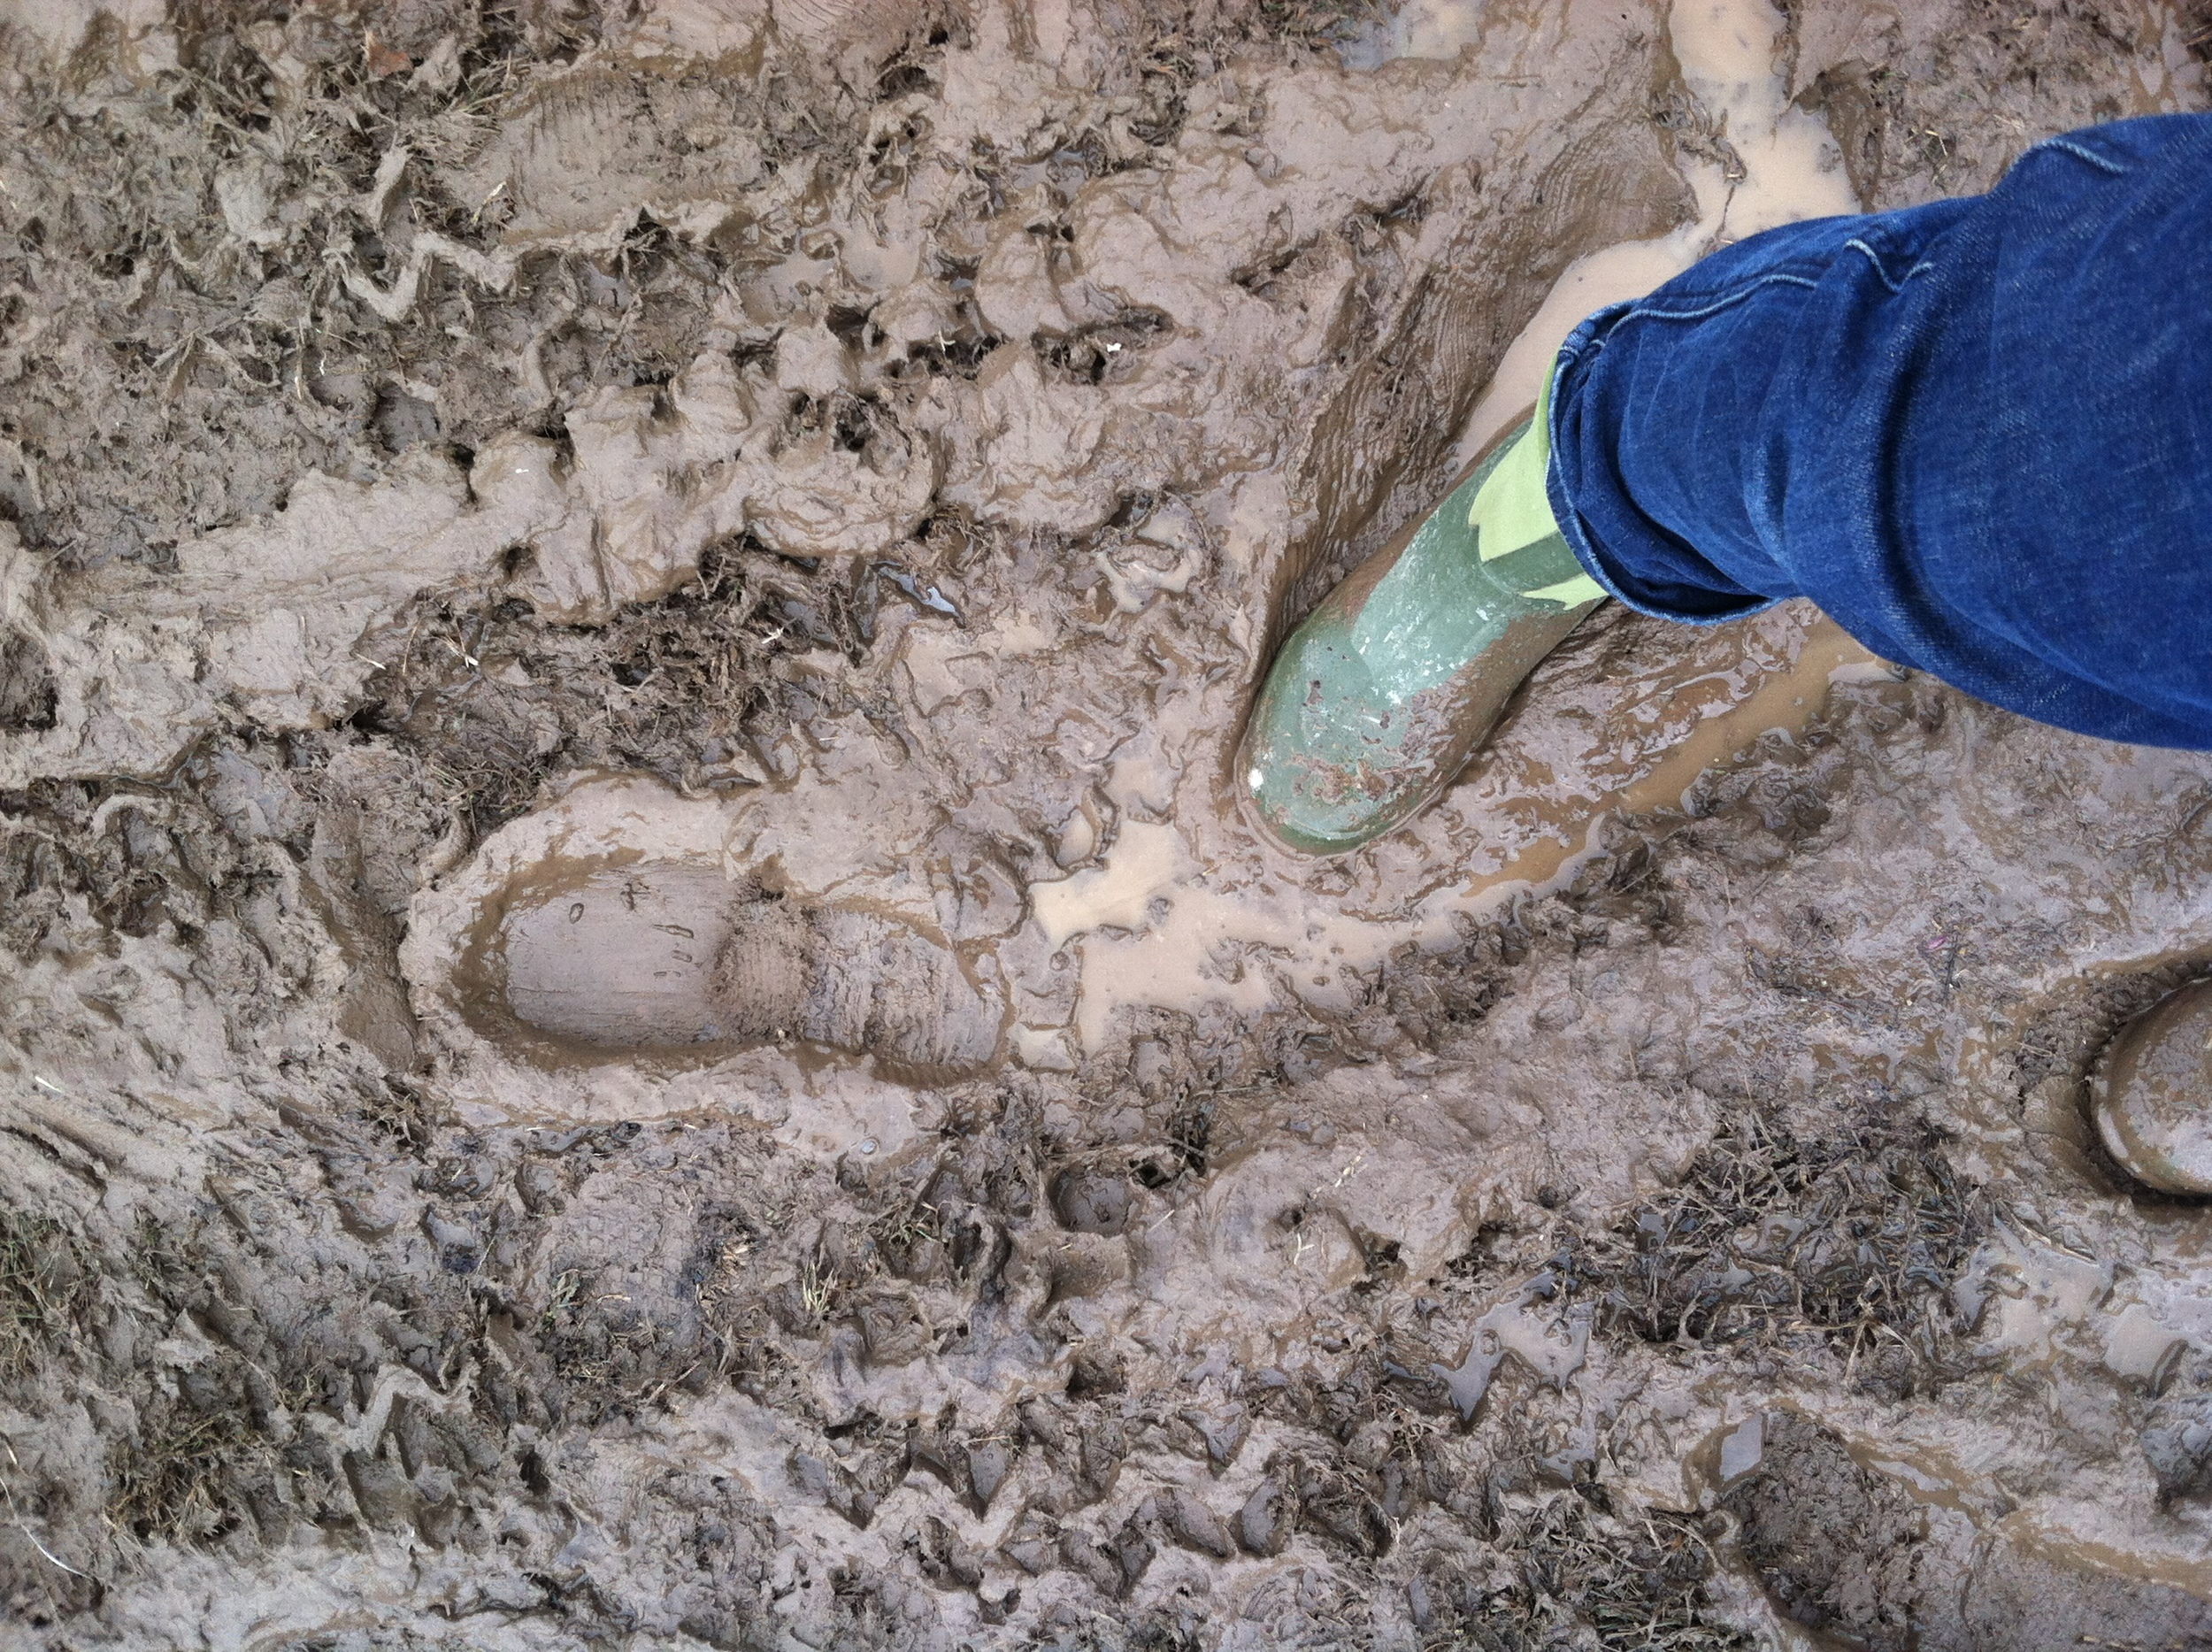 mud season in full effect